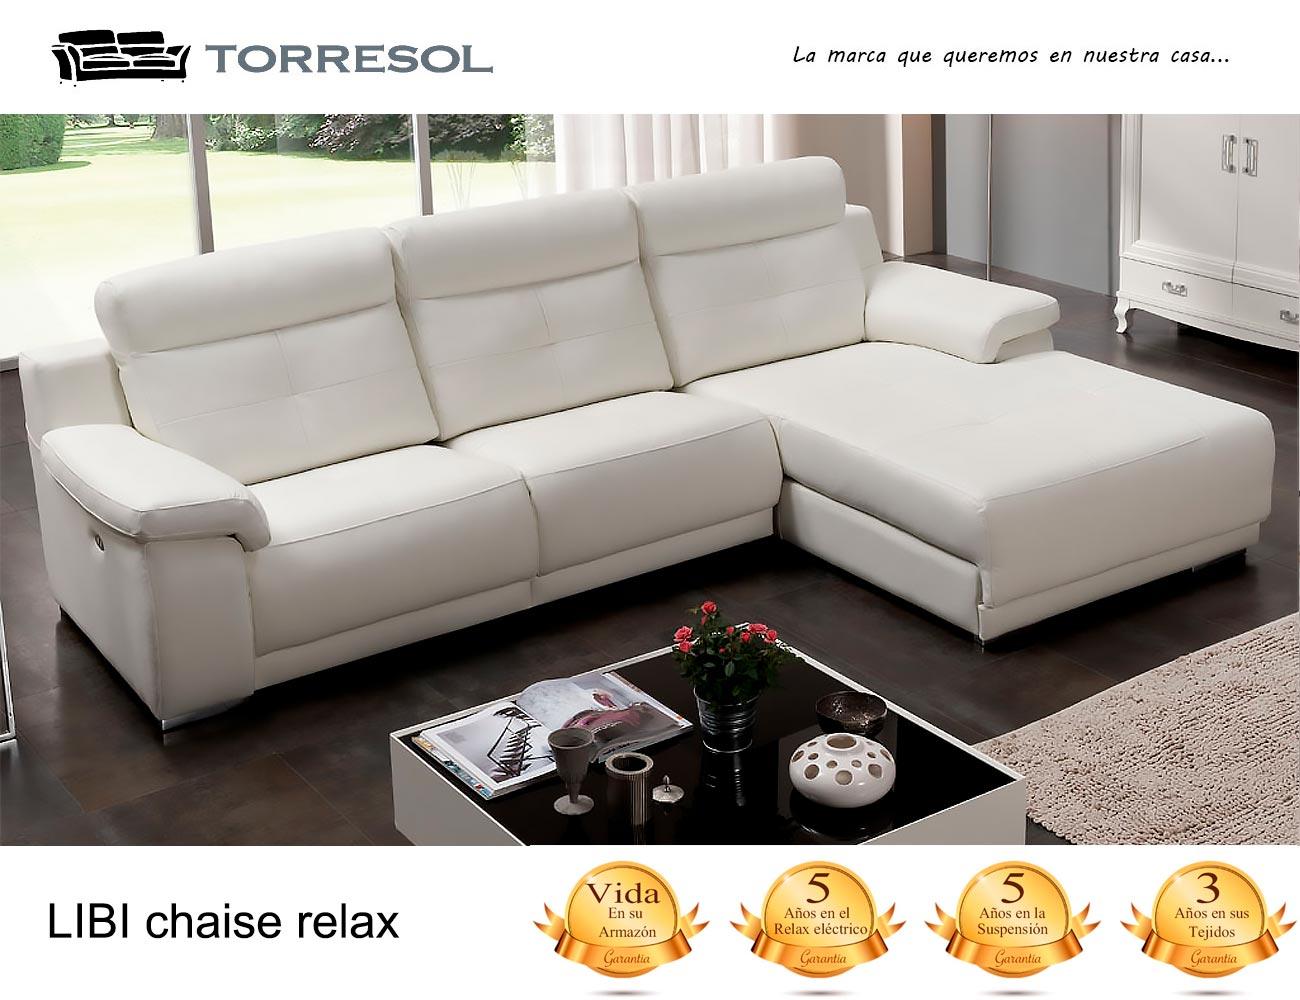 Sofa libi torresol en piel